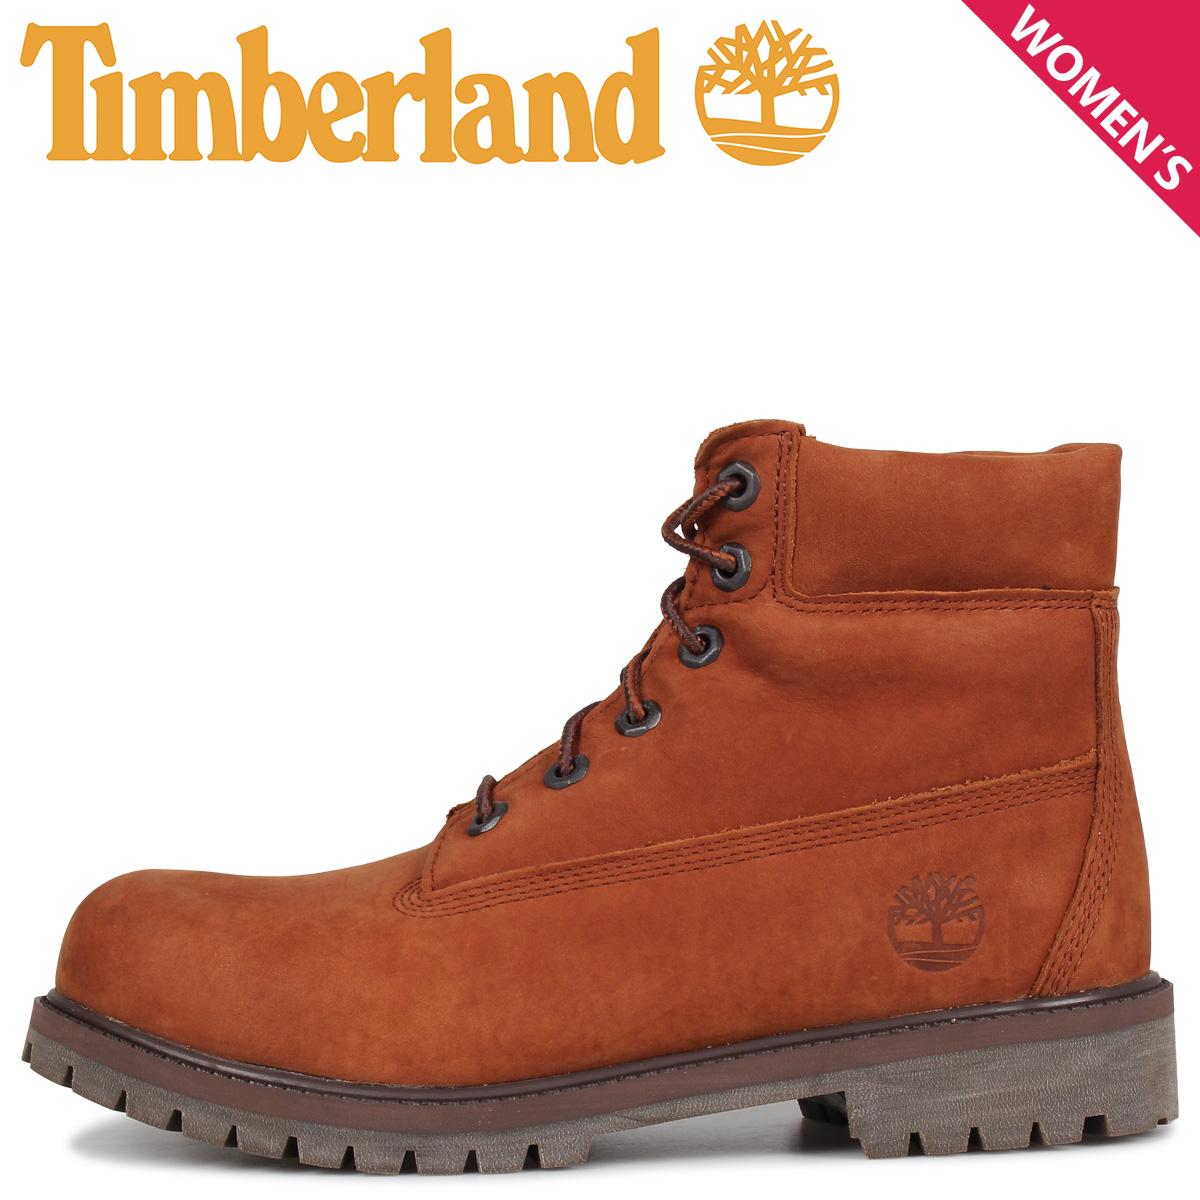 Timberland ティンバーランド ブーツ レディース 6インチ プレミアム JUNIOR 6INCH PREMIUM WATERPROOF BOOT ブラウン A2BKM